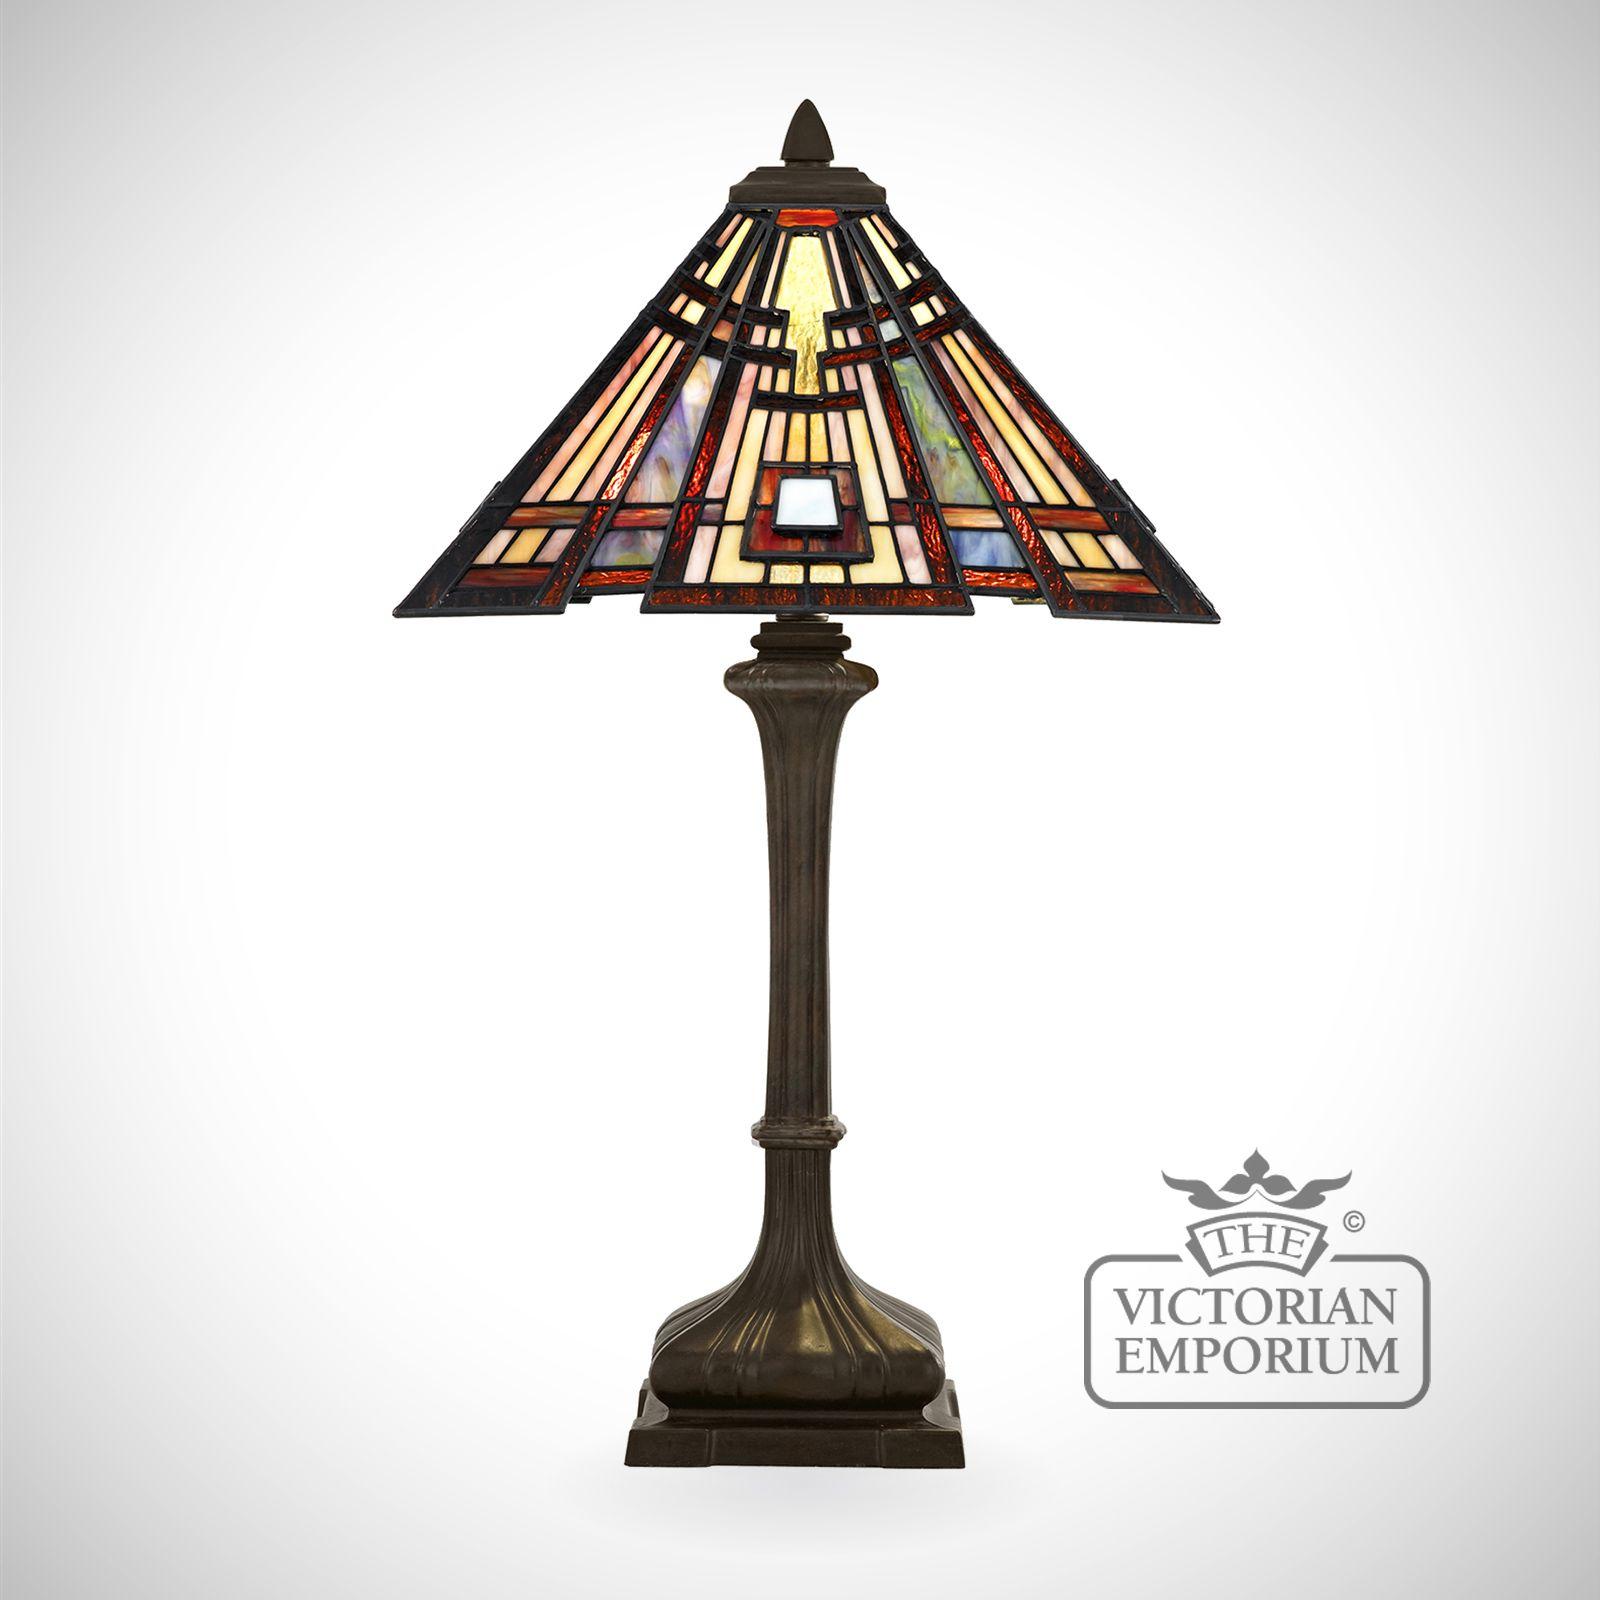 Tiffany Craftsman Table Lamp The Victorian Emporium